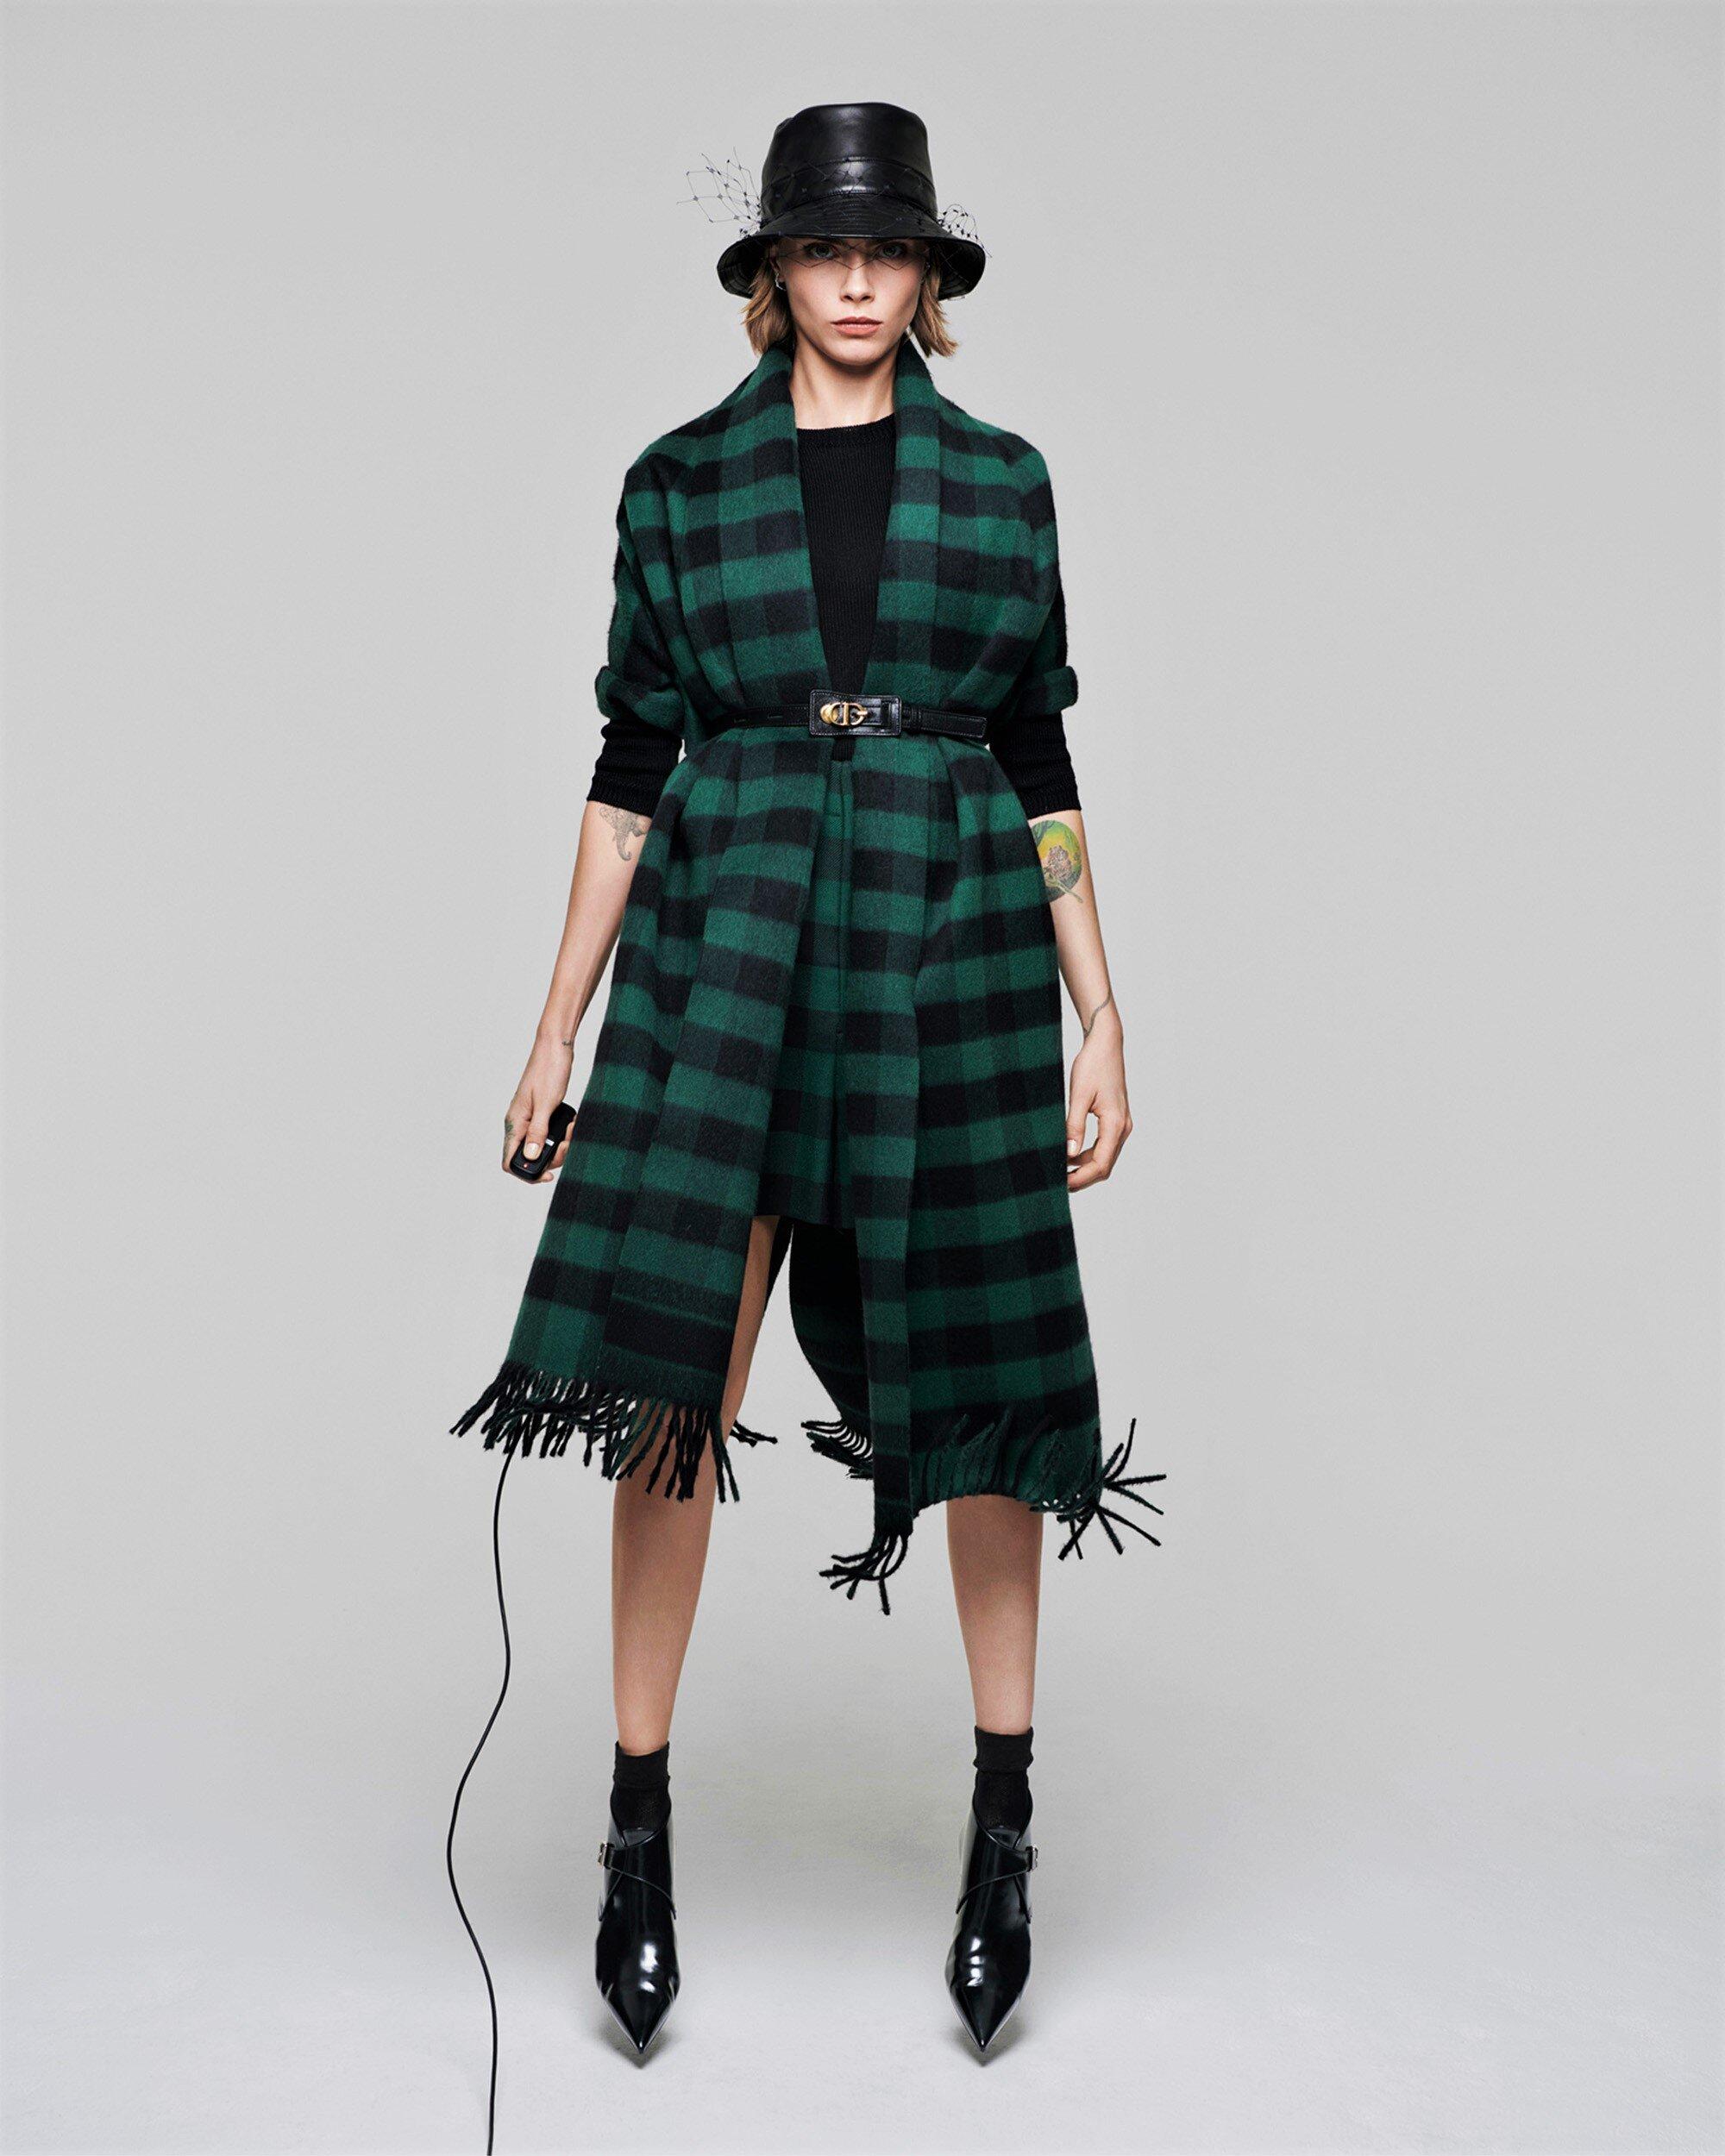 Cara Delevingne-Dior-V Magazine  (5).jpg